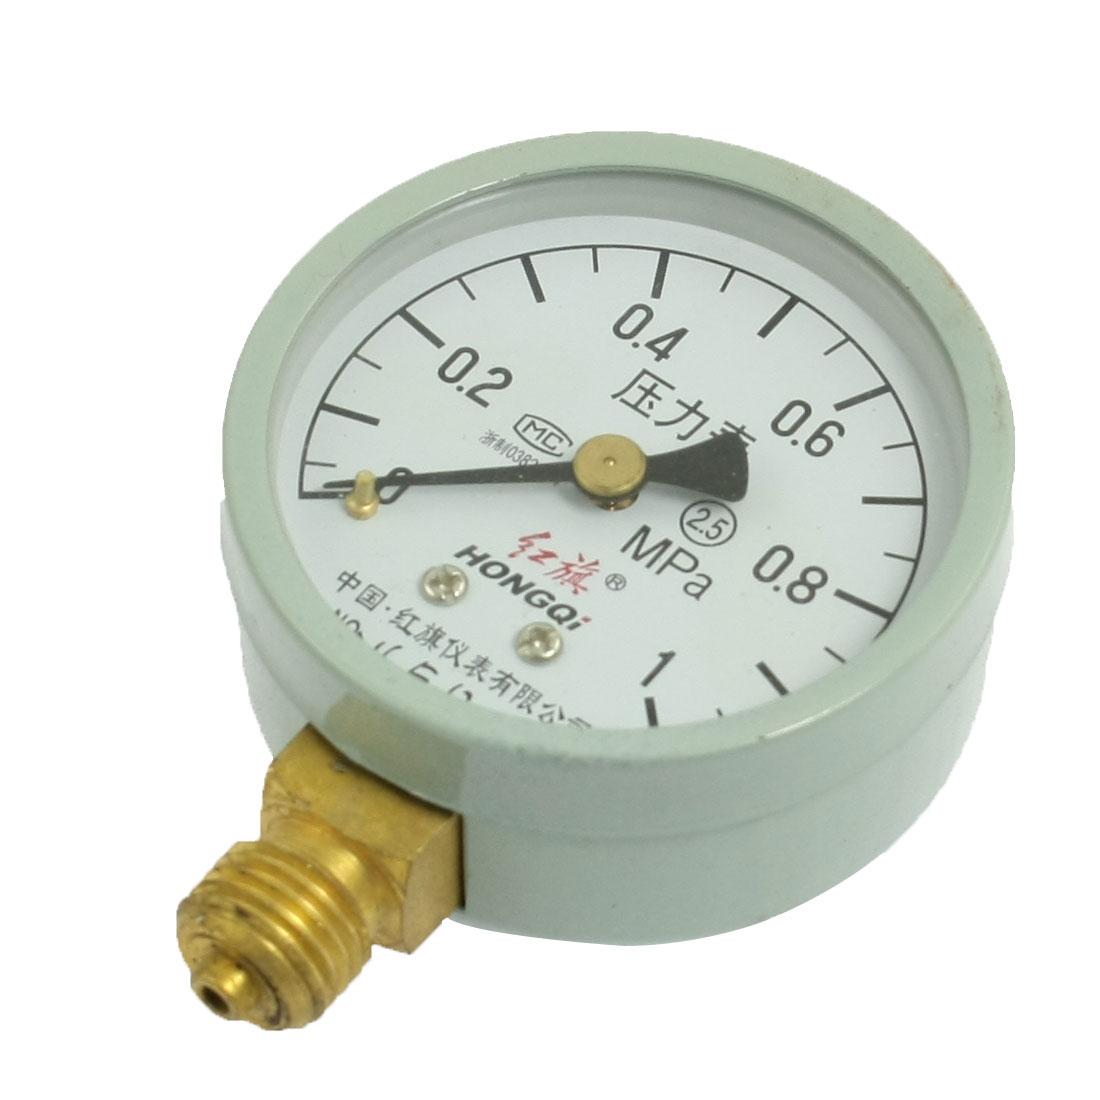 "1/4"" Male Thread Horizontal Pneumatic Pressure Gauge 0-1.0 MPa"